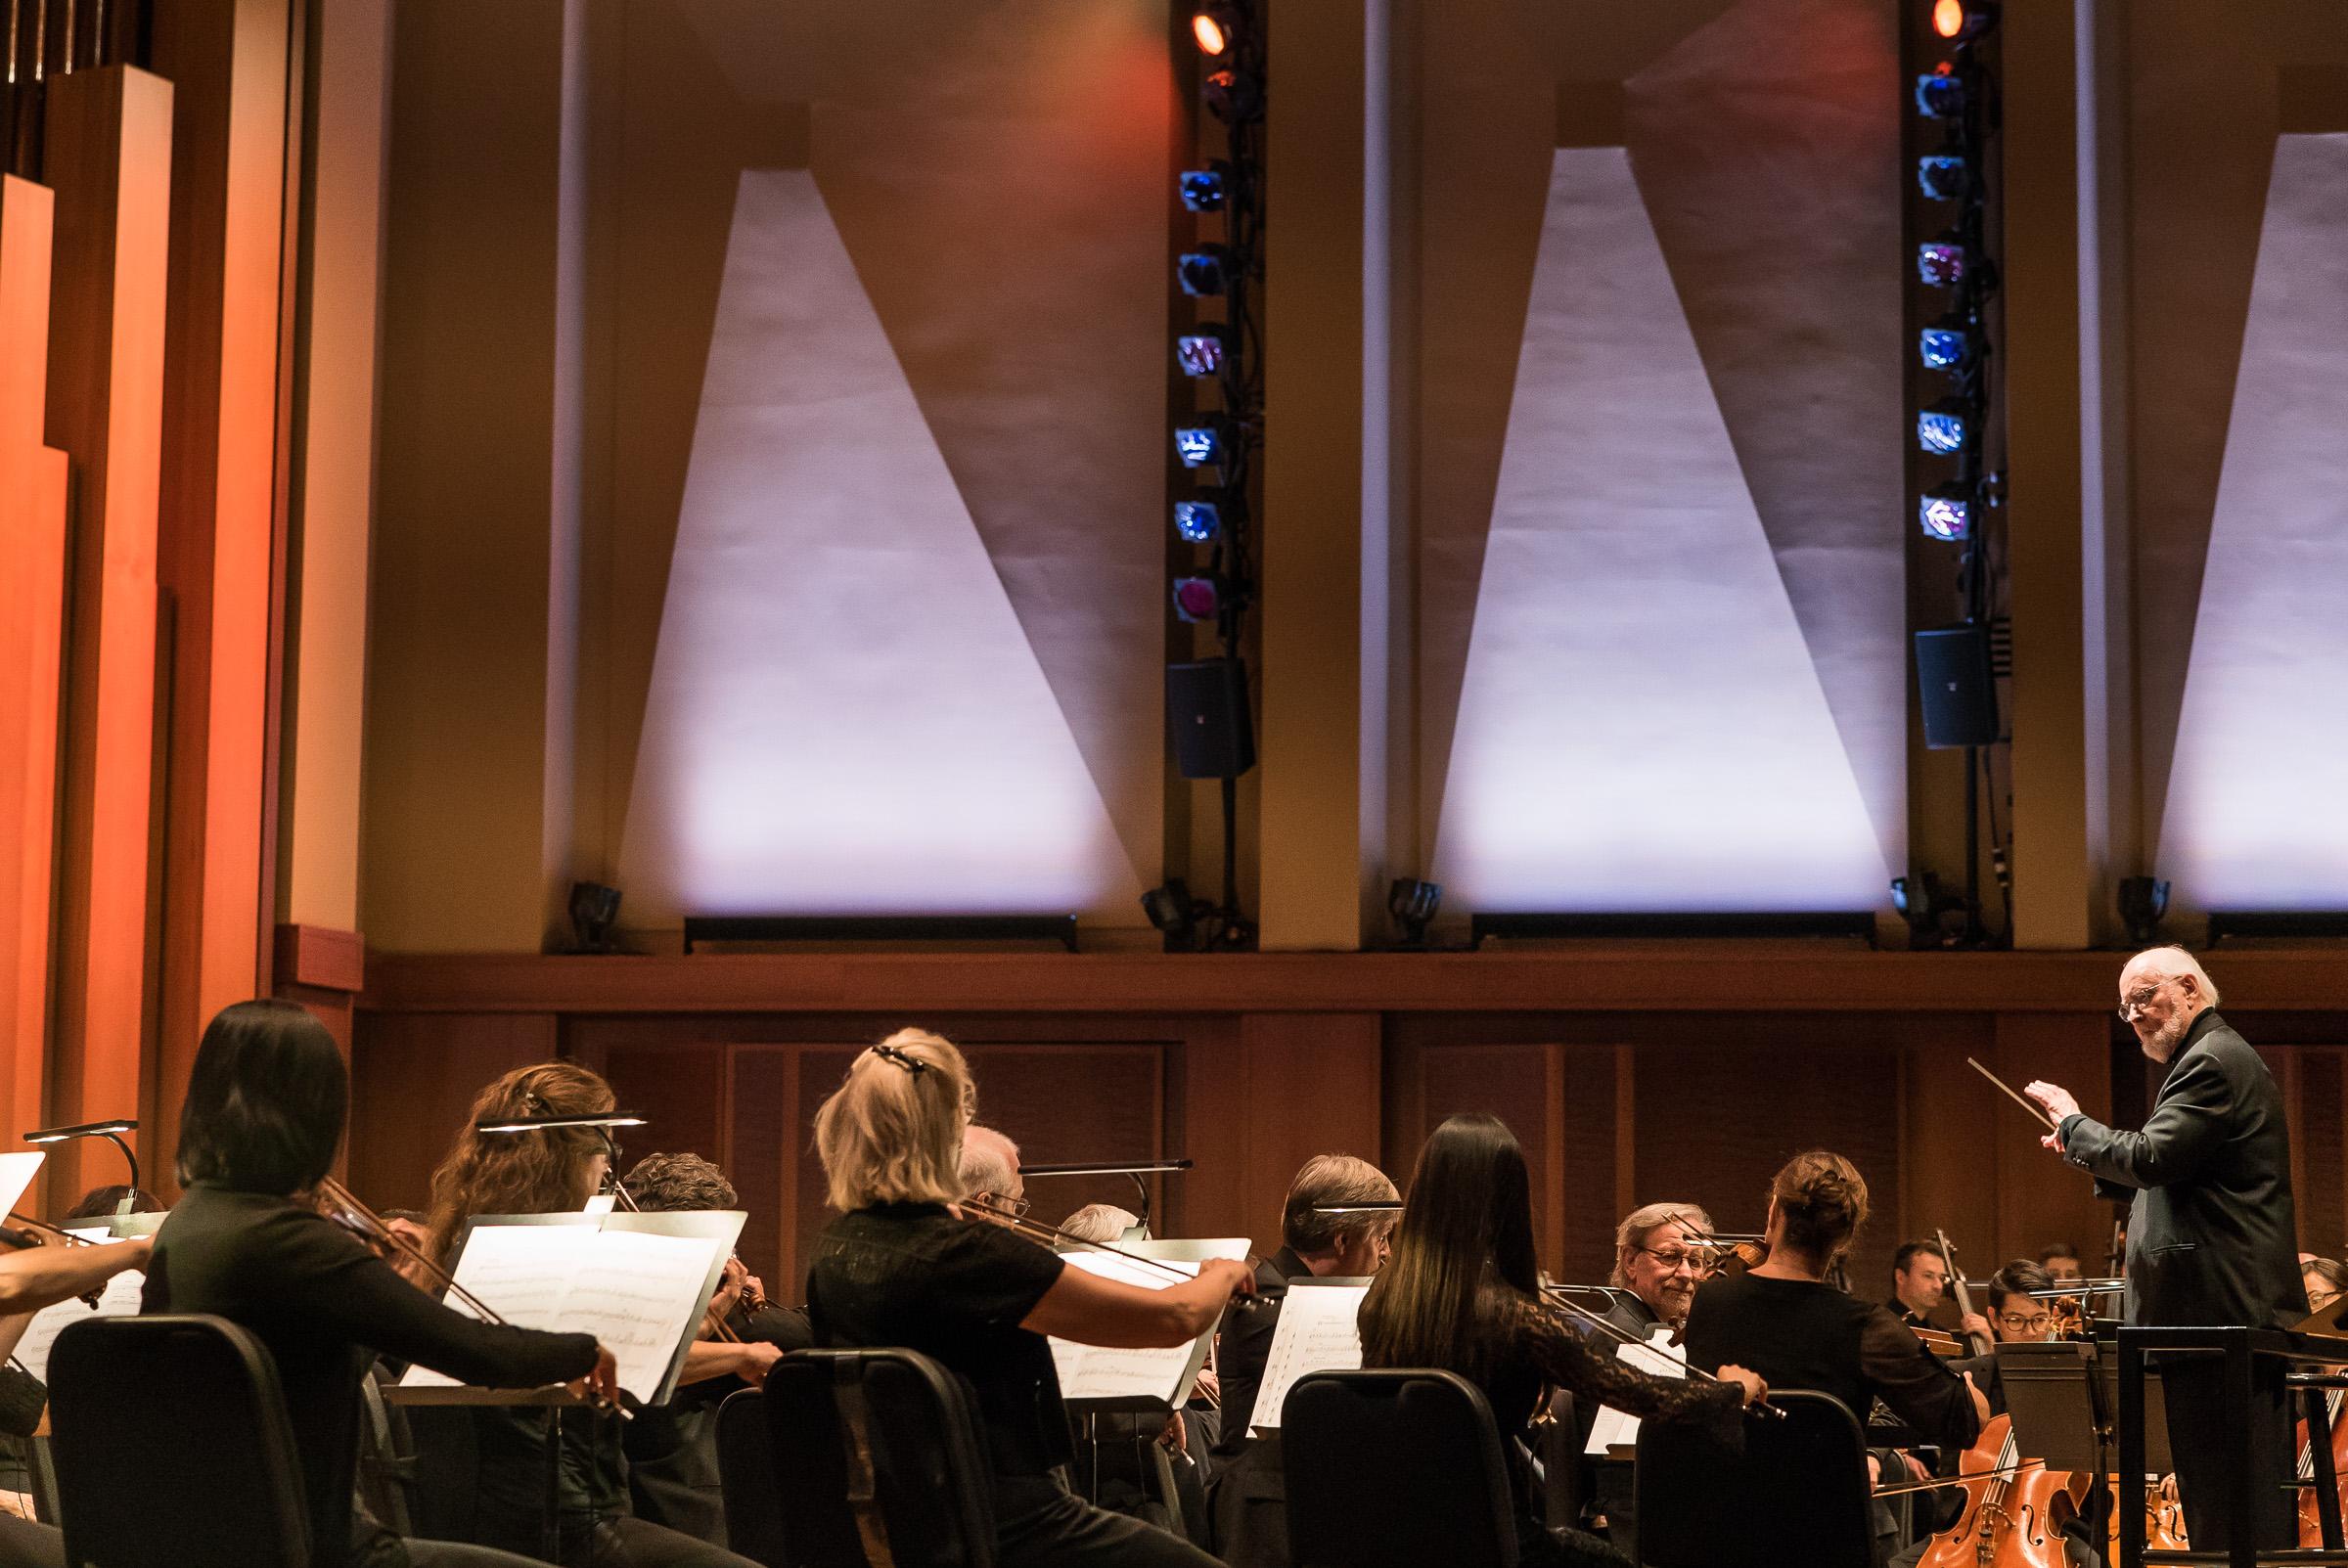 brandon_patoc_john_williams_Steven_Spielberg, Seattle_Symphony_Orchestra_Conert_0050.JPG